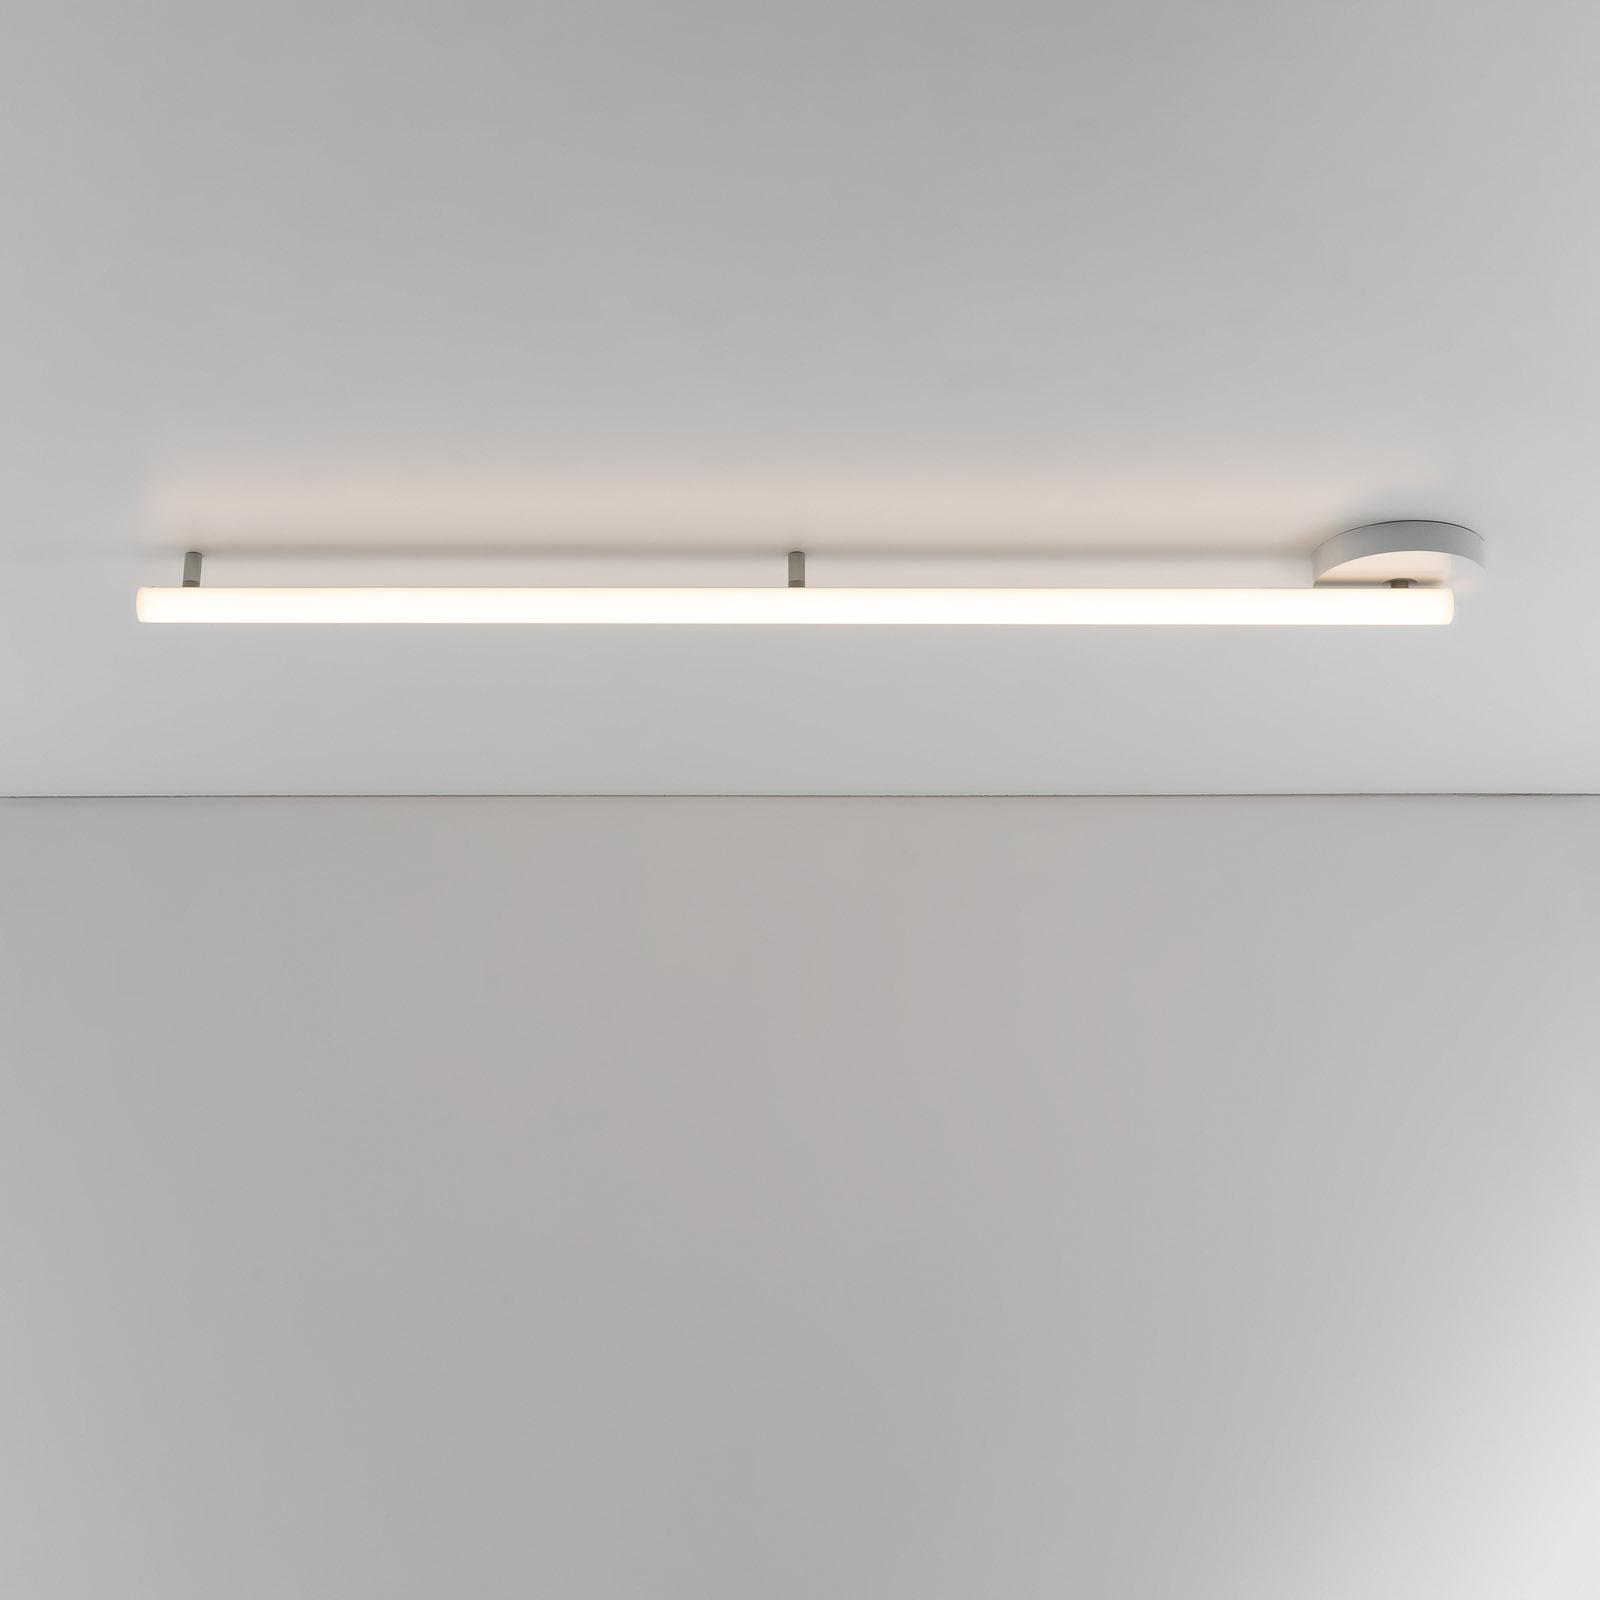 Artemide Alphabet of light linear Decke App 120